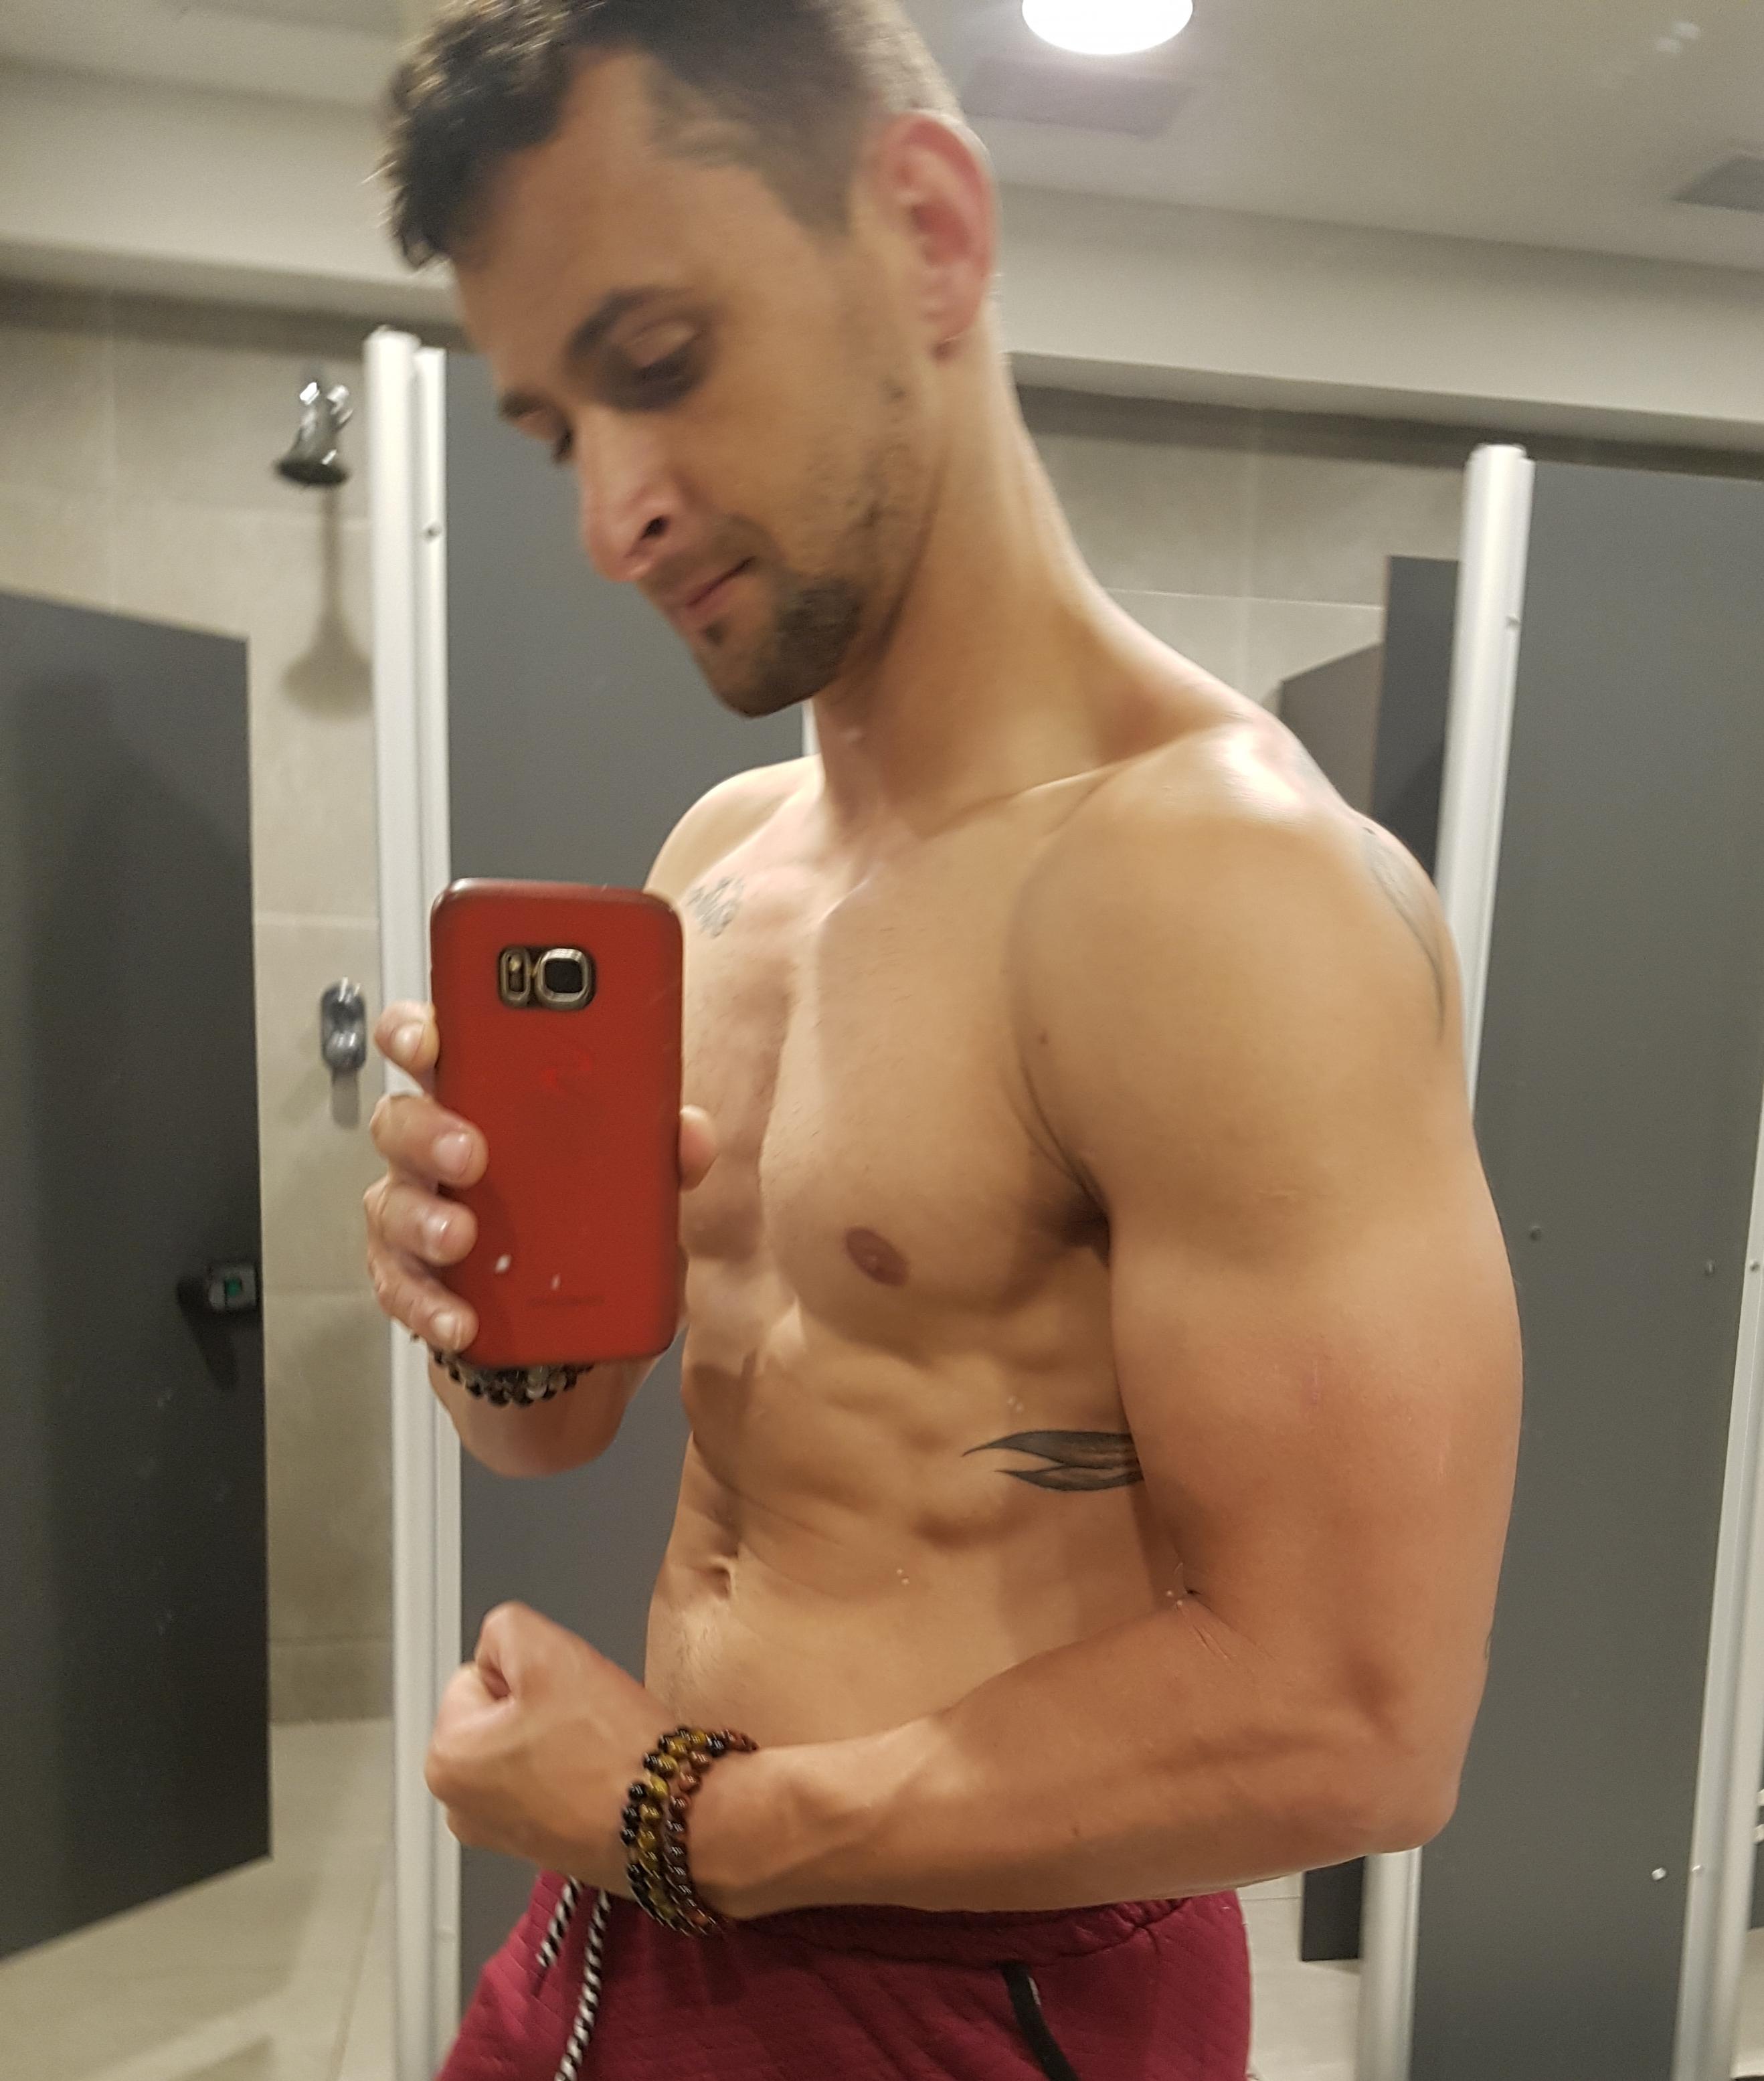 Personal Trainer Amandio Almeida Chaves